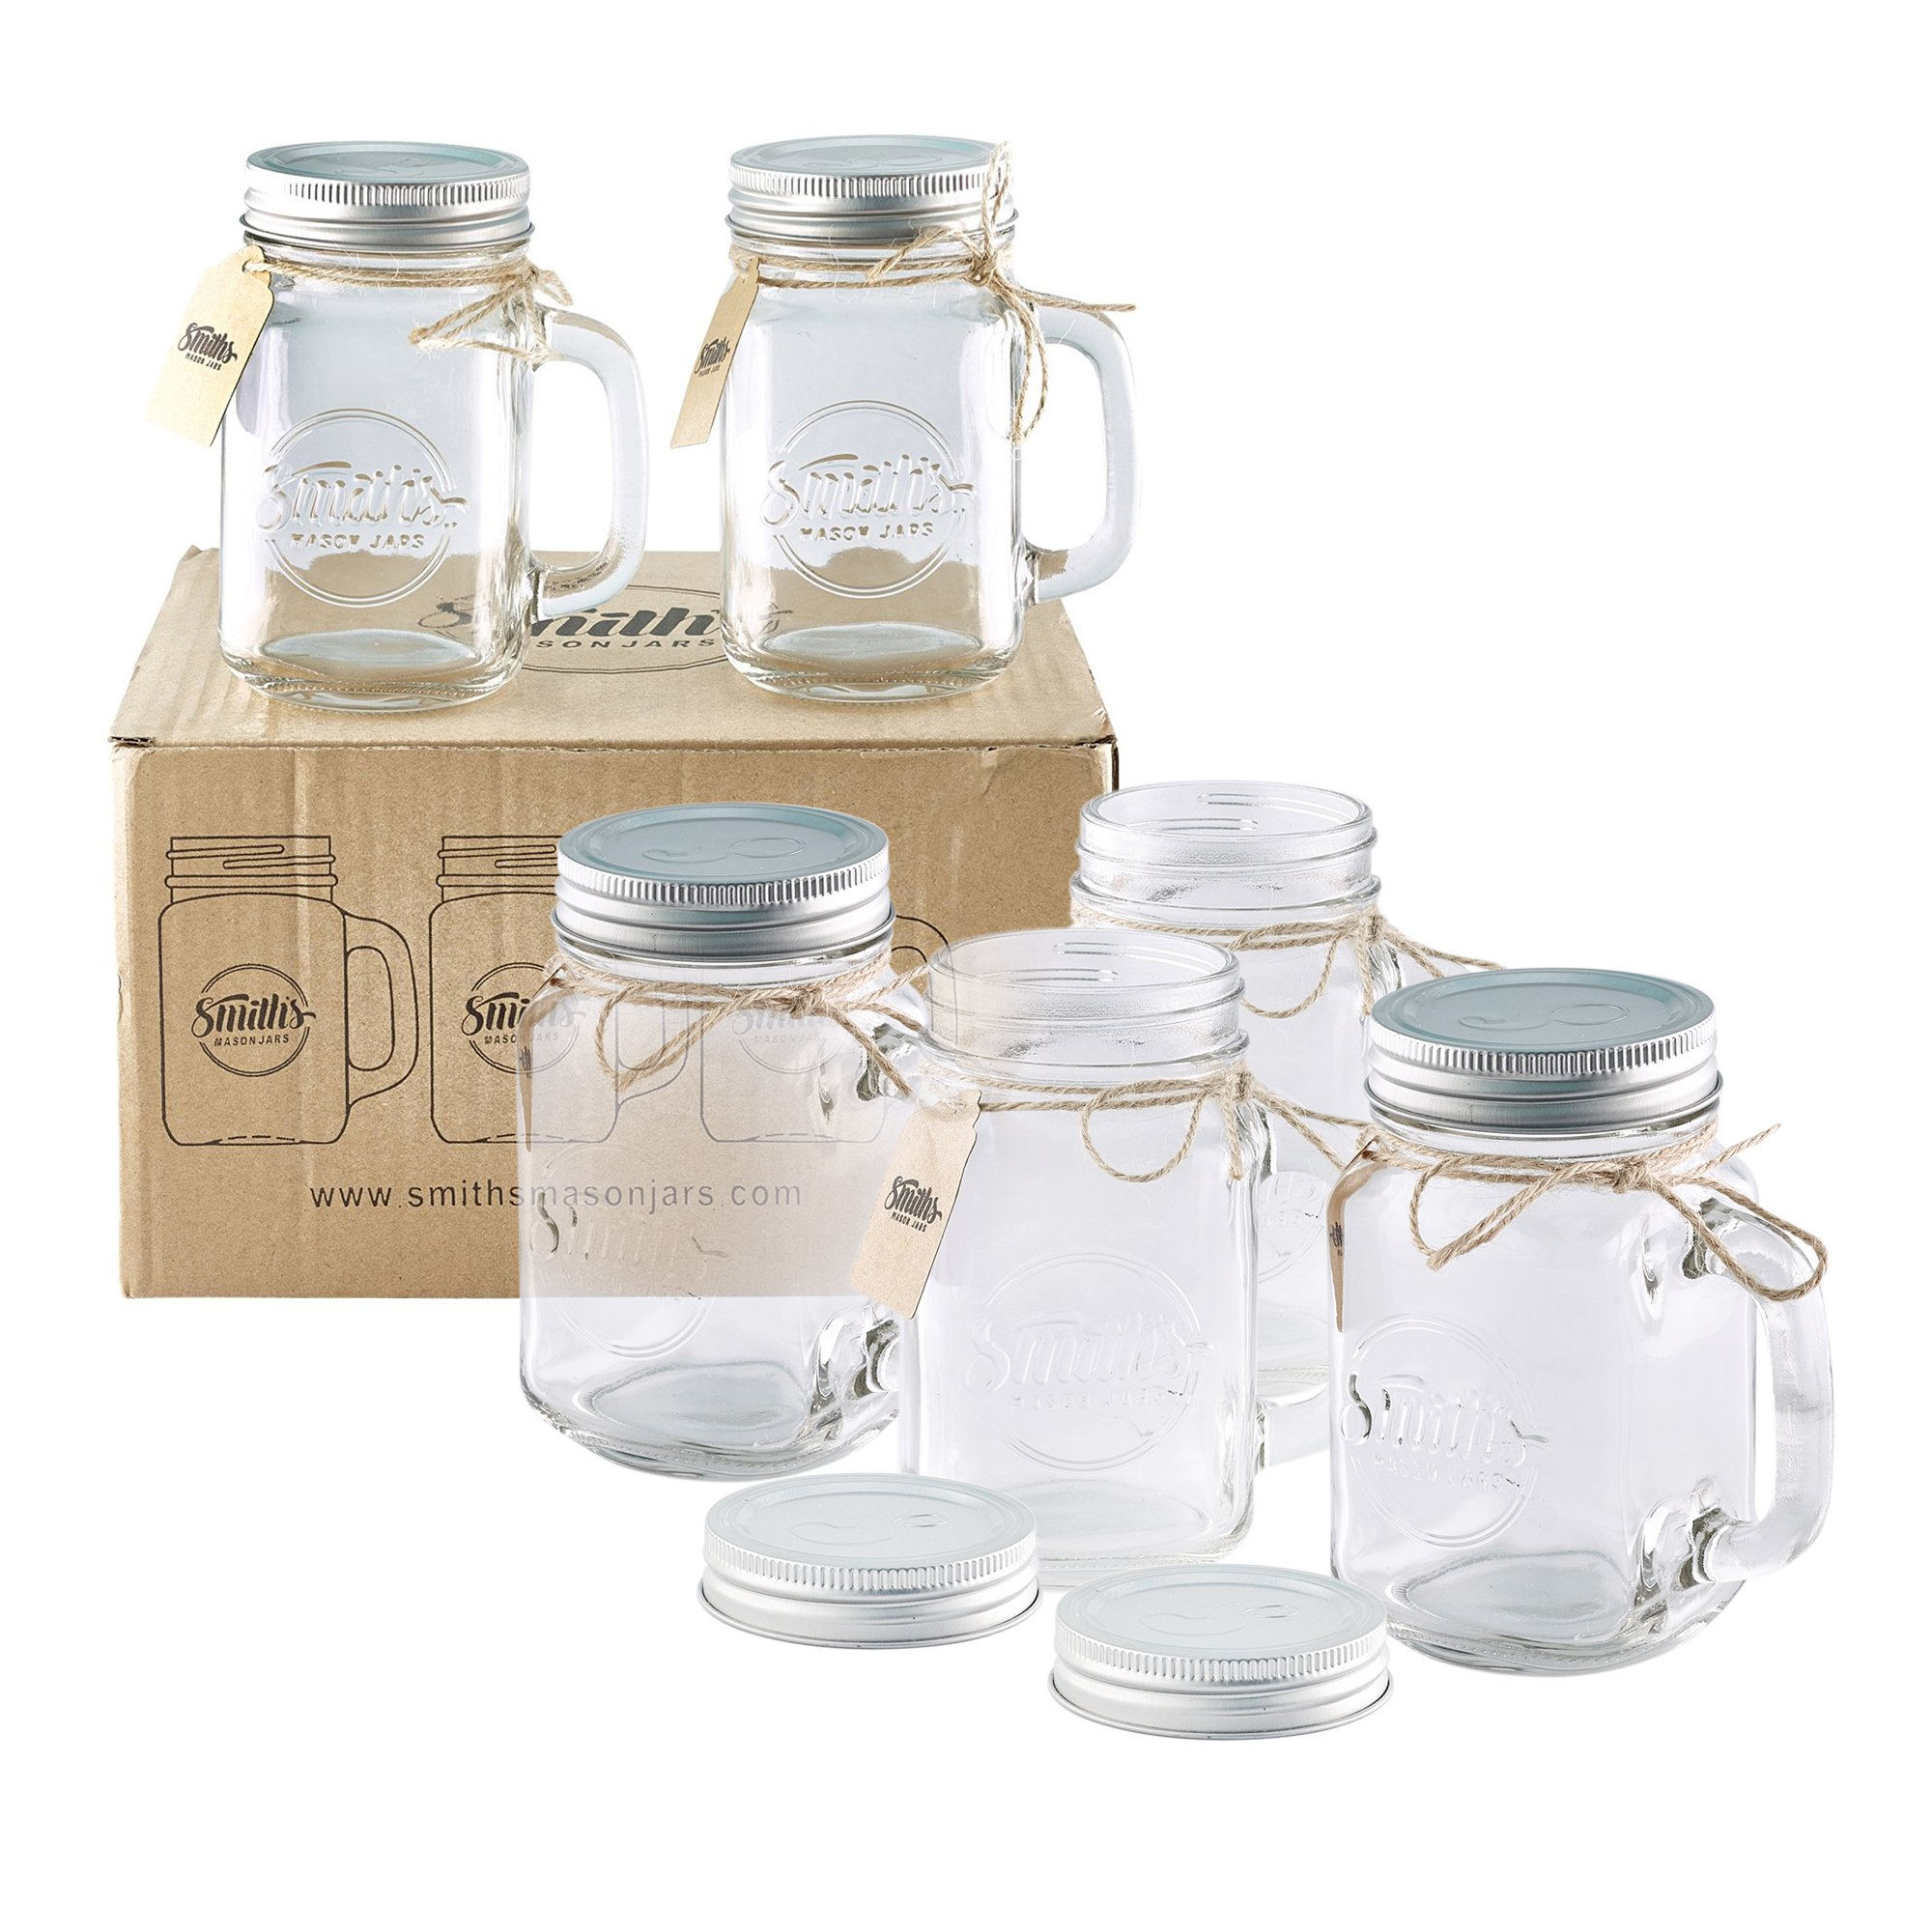 Smith\'s Mason Jars 6 x 16oz Mason Jar Mugs with Lids 646437475556 | eBay